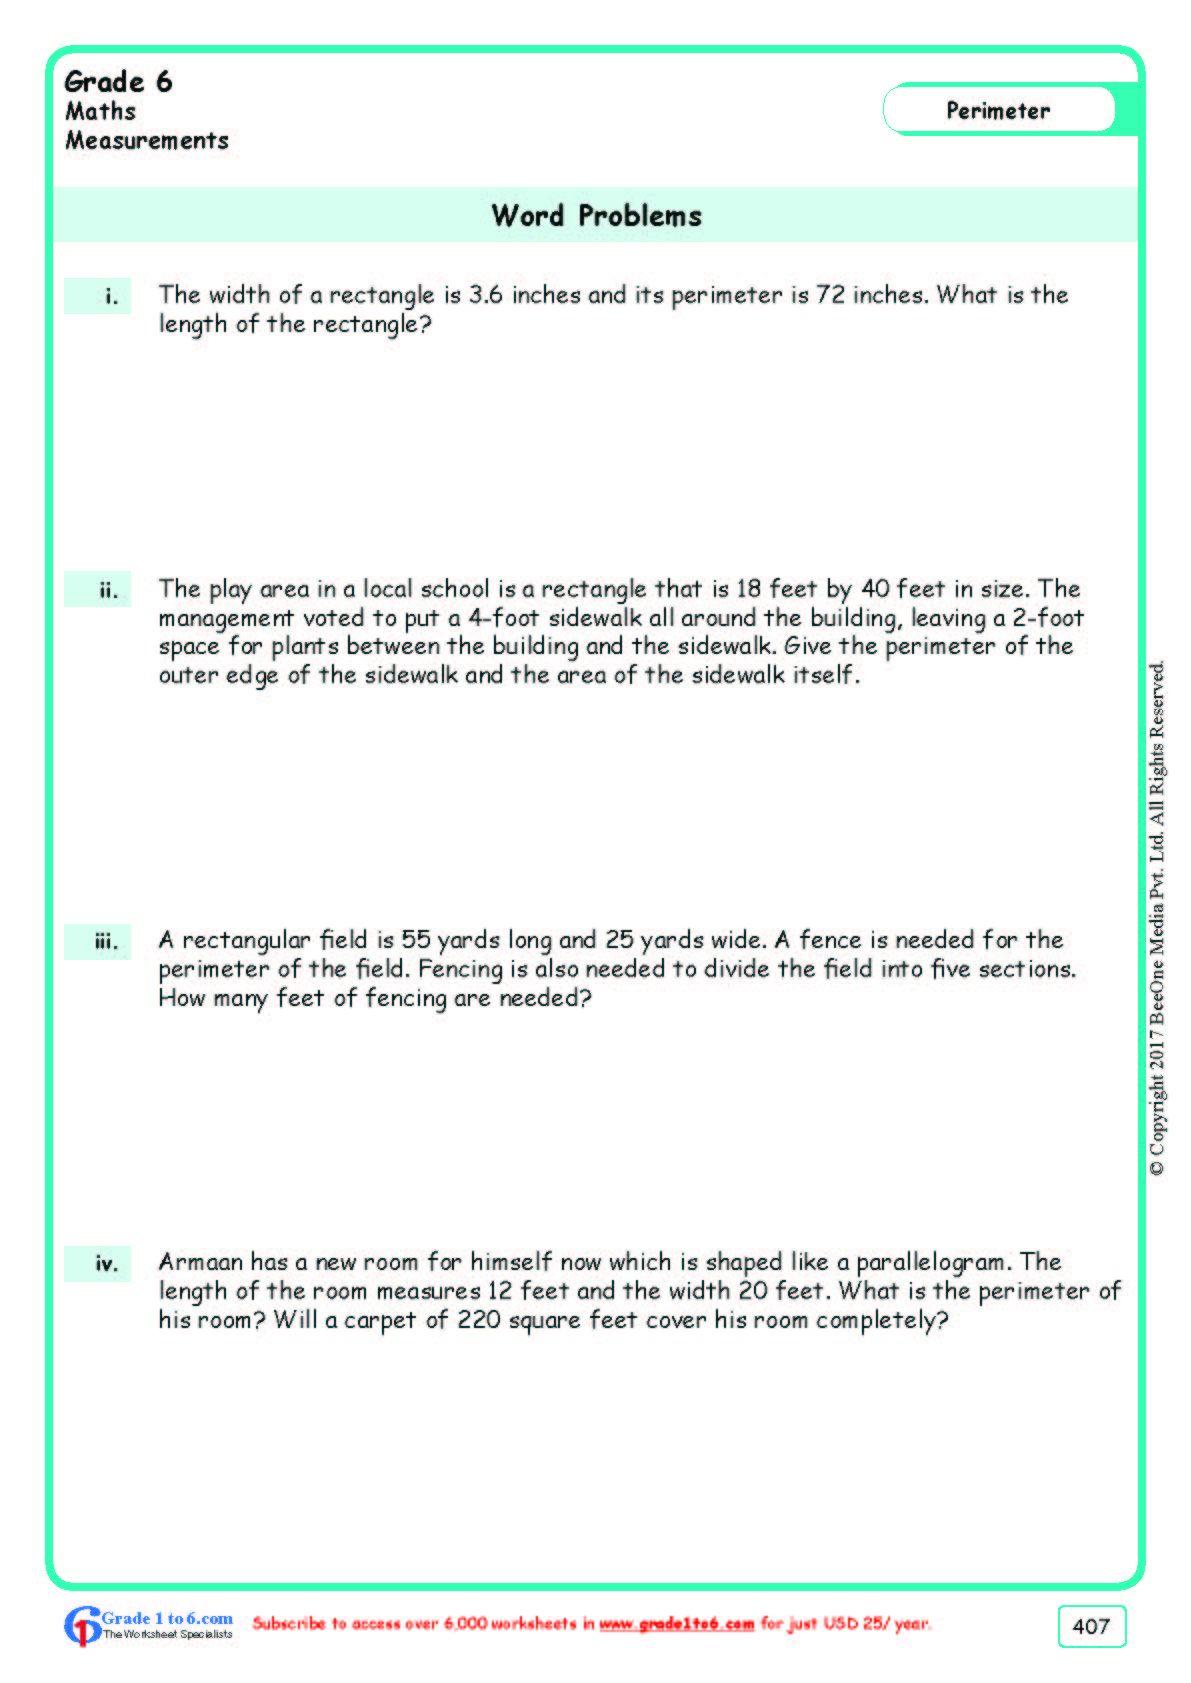 Worksheet Grade 6 Math Word Problems Math Word Problems Math Words Word Problems